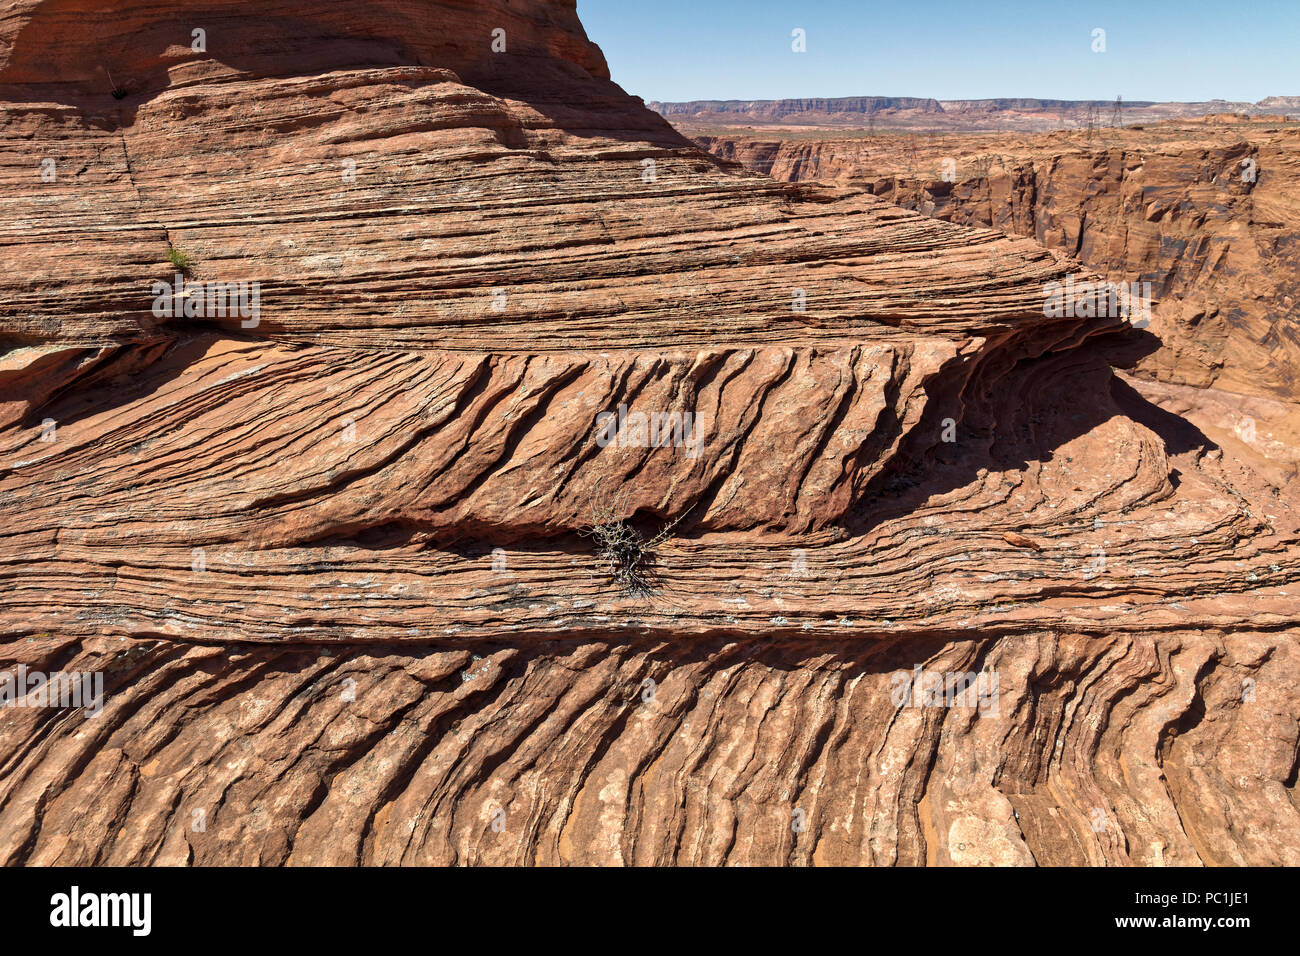 Literie croix en grès Navajo à Horseshoe Bend, Glen Canyon National Recreation Area, Page, Arizona Photo Stock